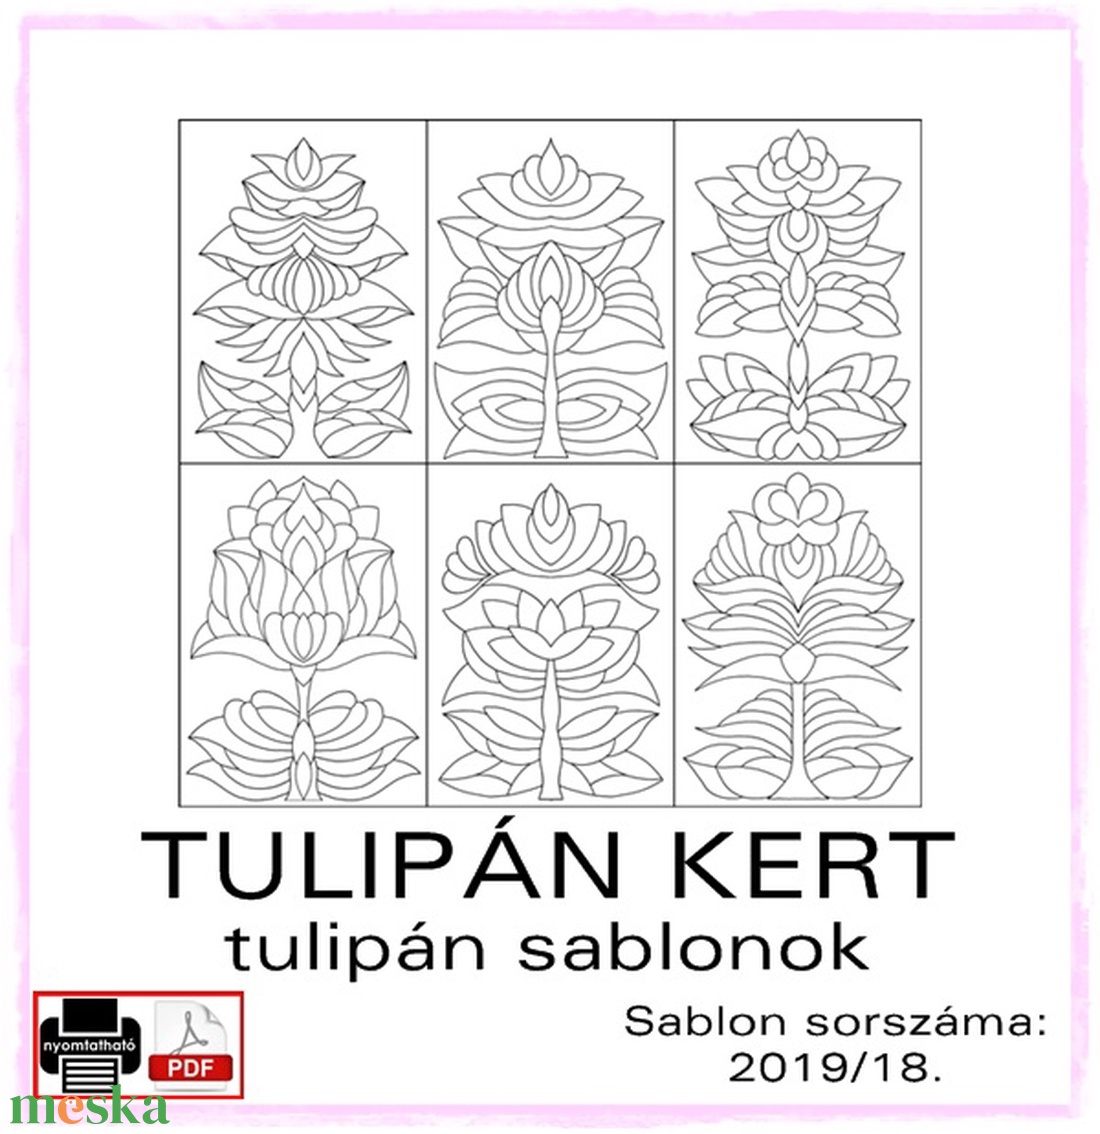 TulipánKert 2019/18 (kedo) - Meska.hu